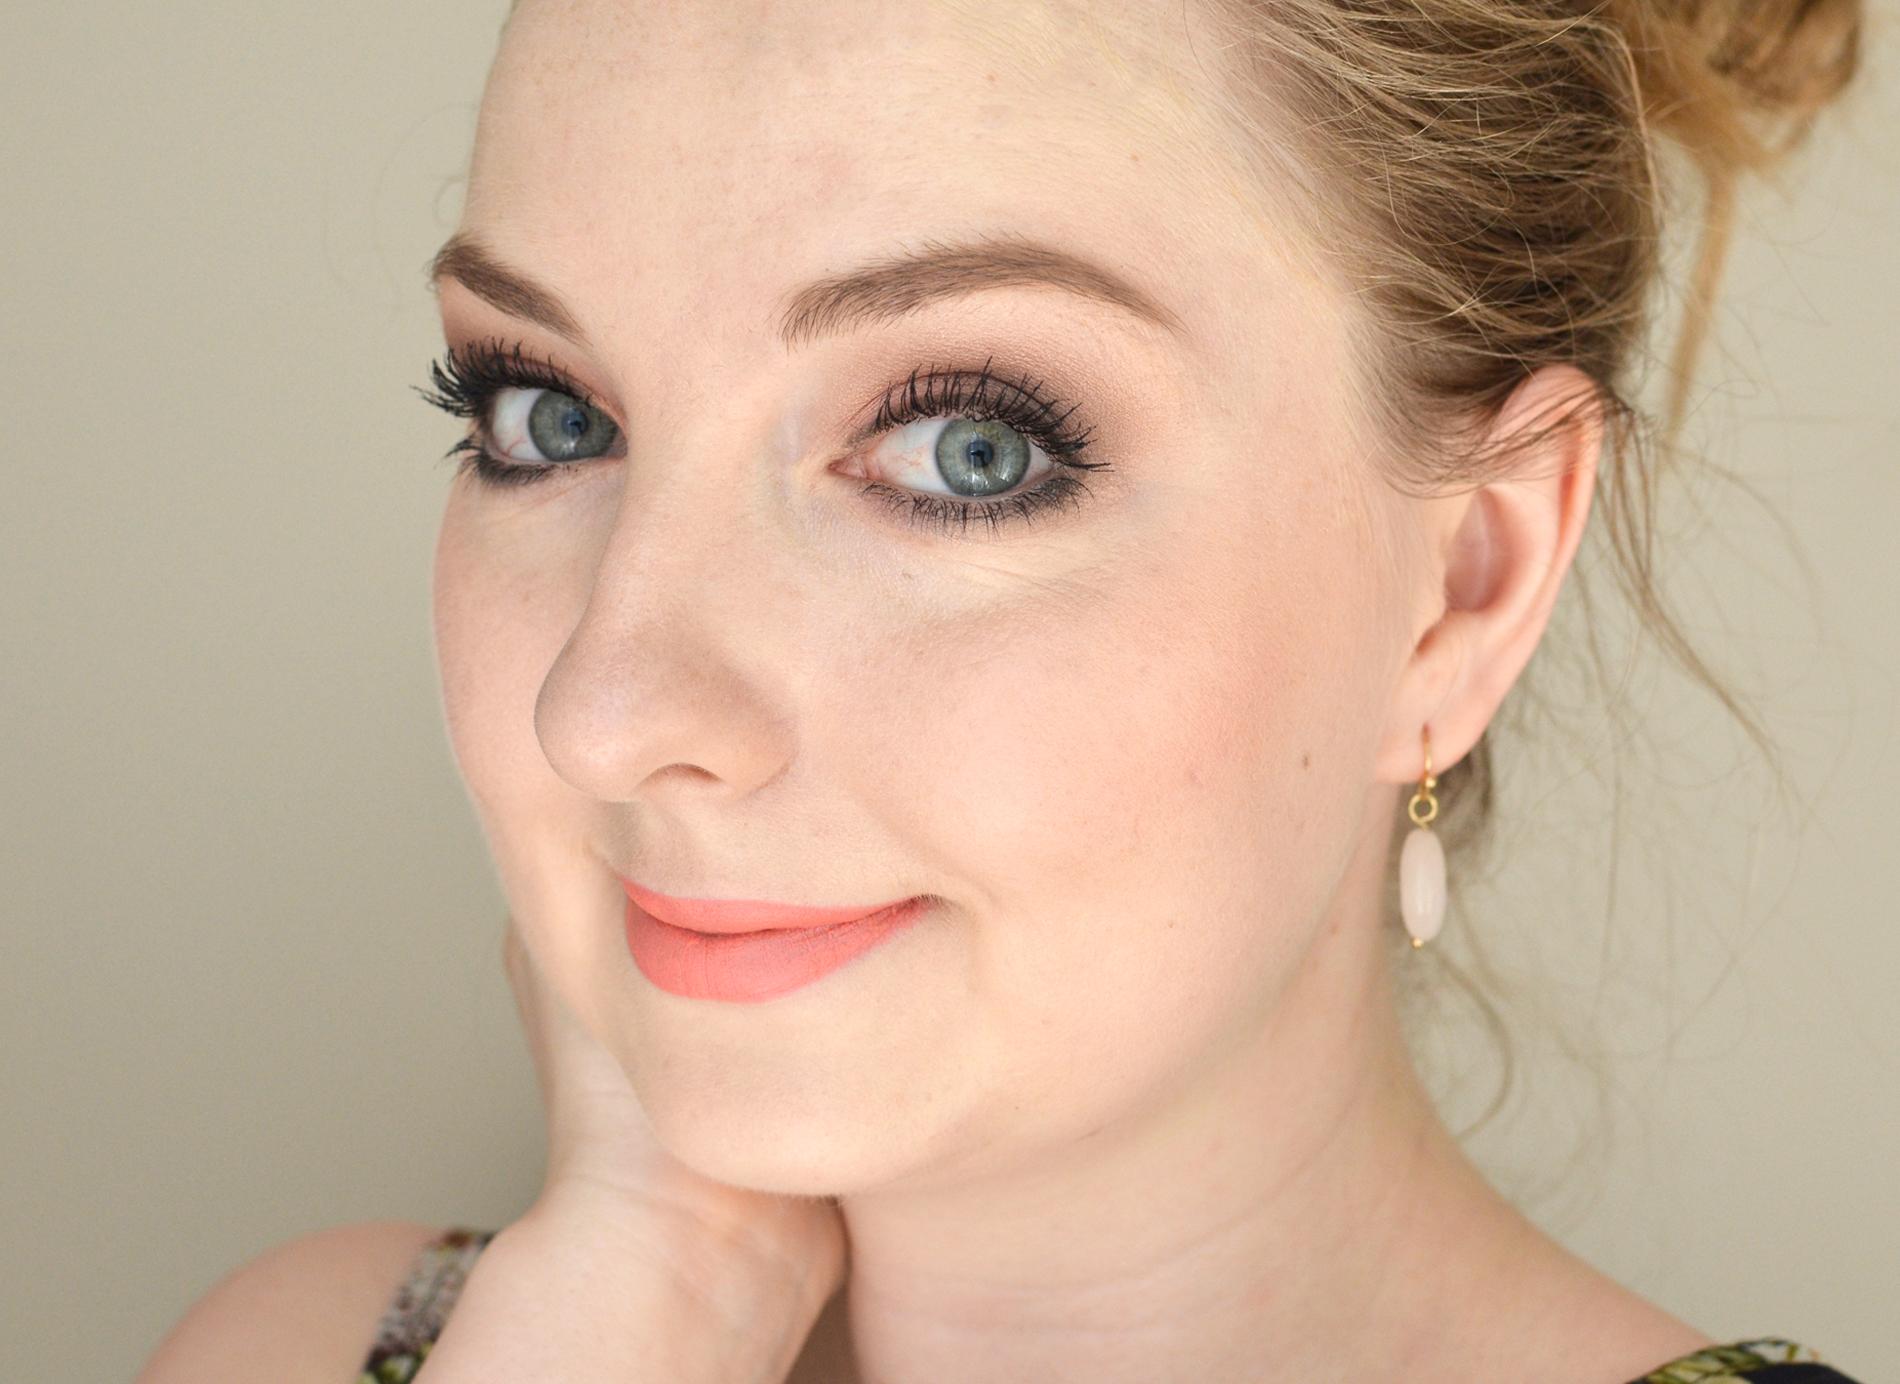 maquillage-avec-mascara-etude-house-lash-perm-curl-fix